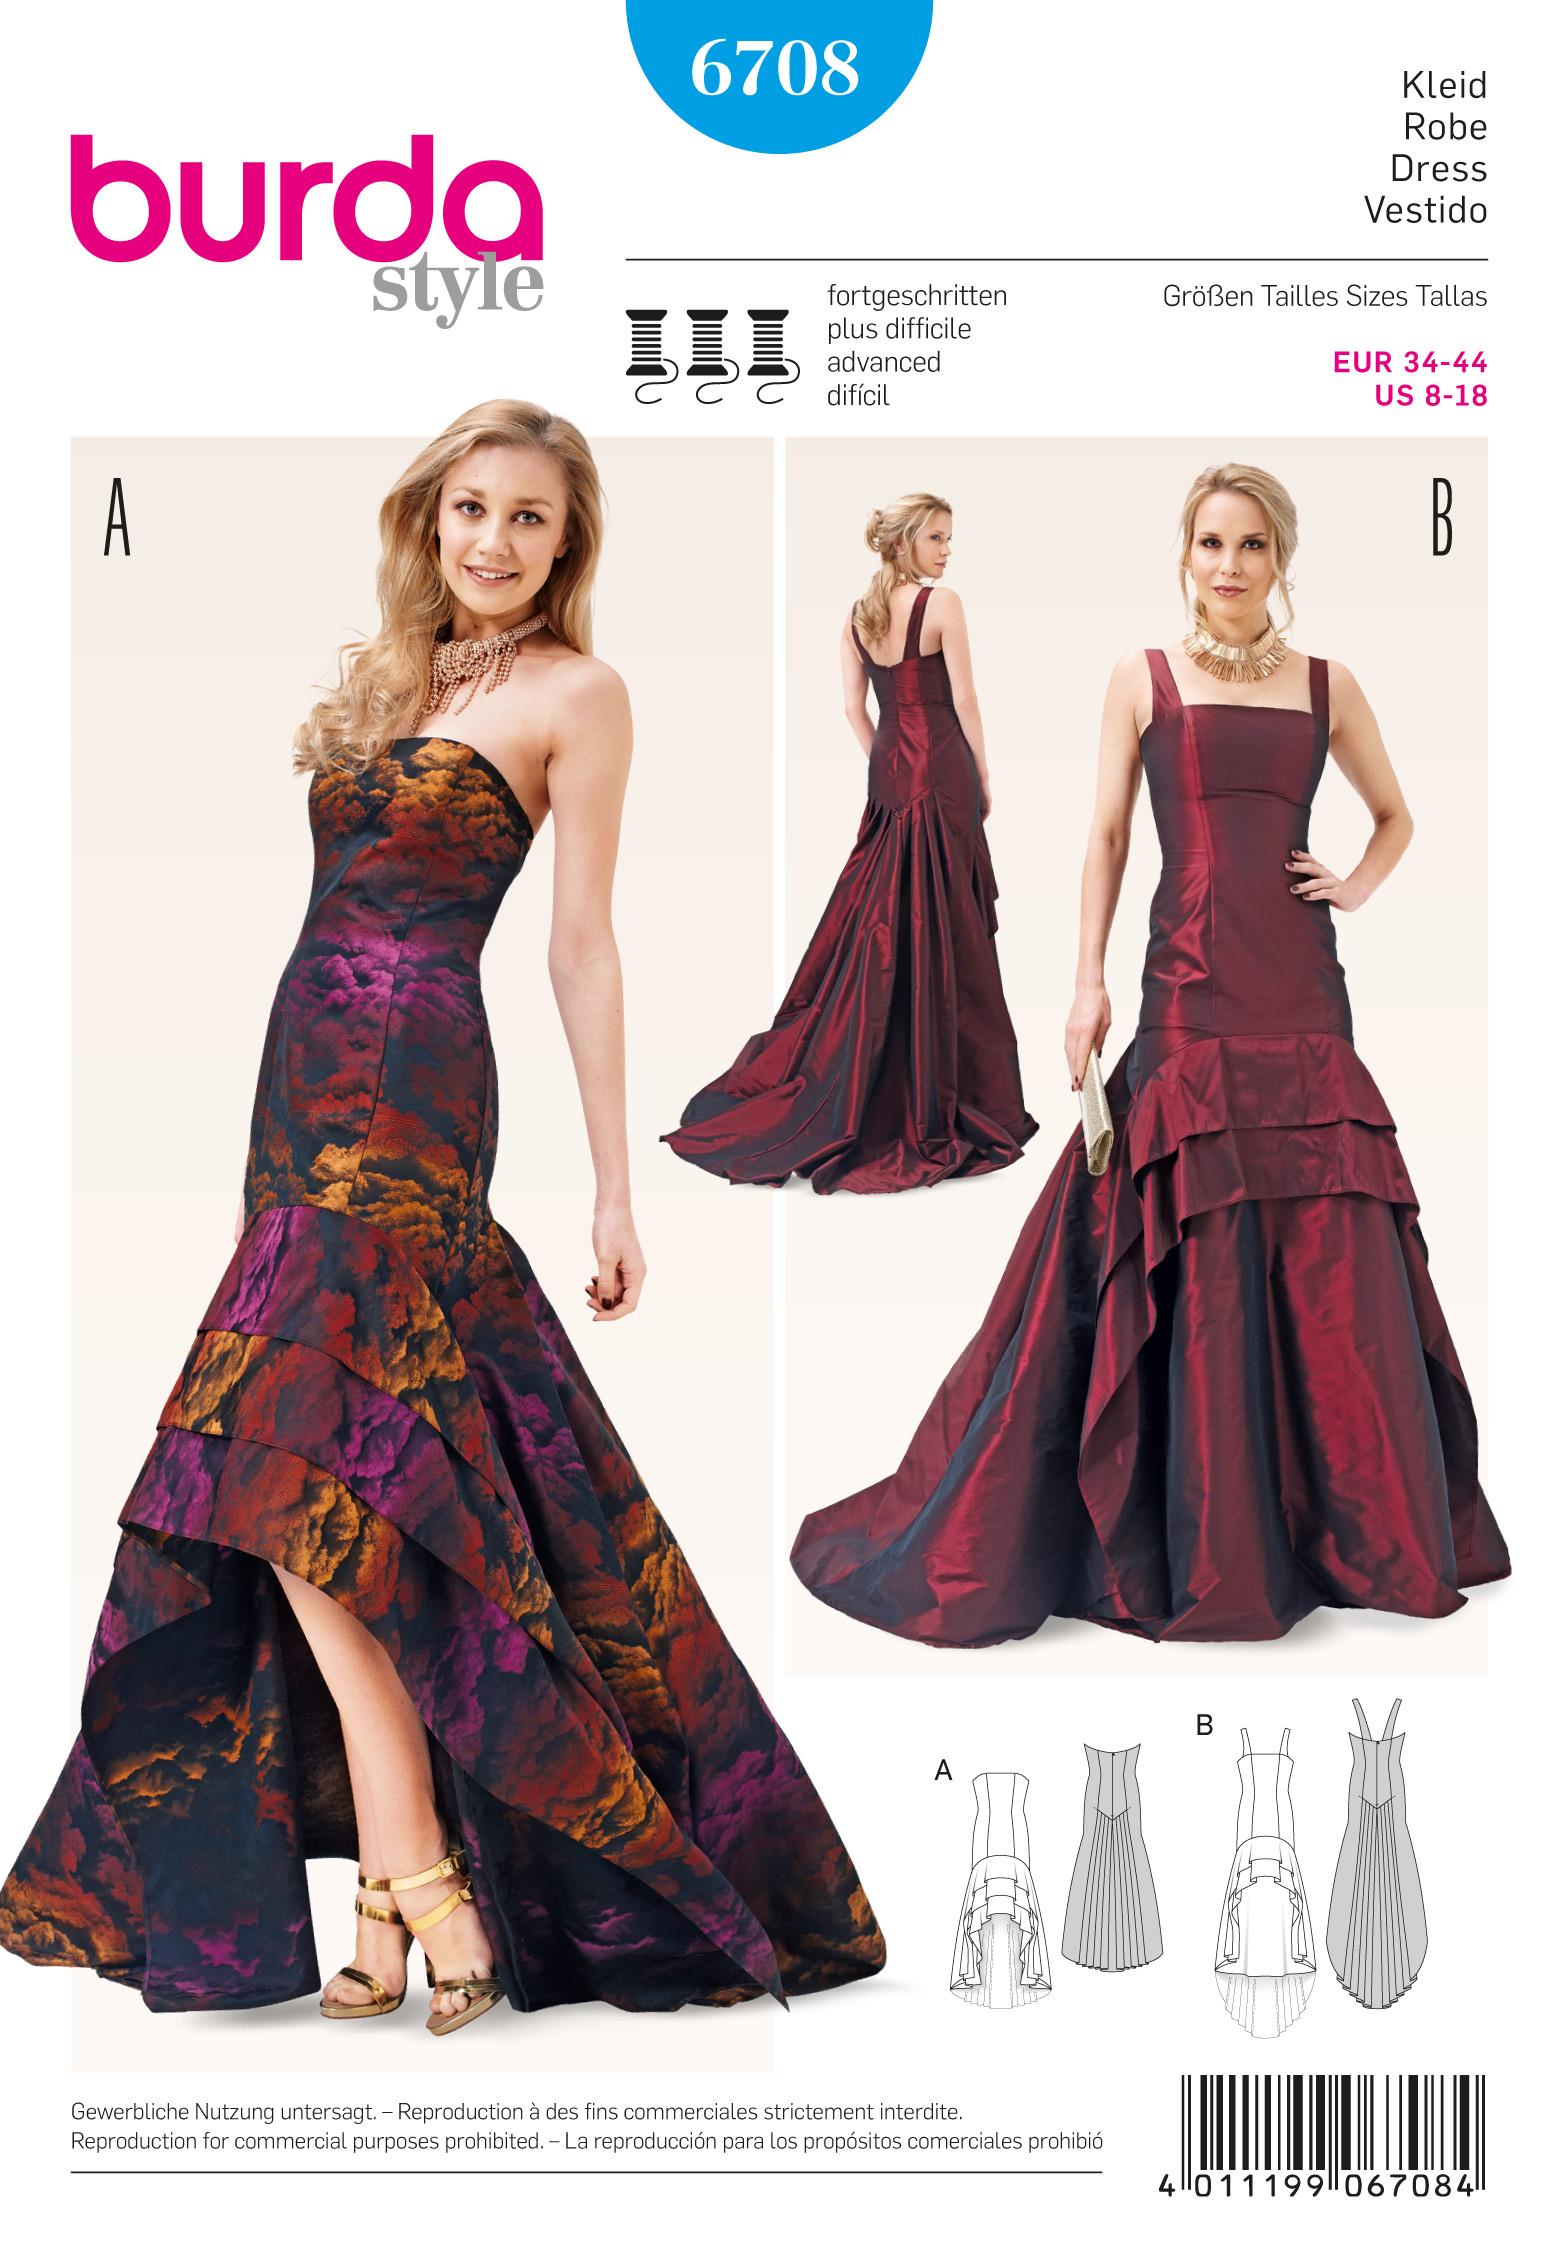 Evening dress sewing patterns burda flower girl dresses evening dress sewing patterns burda 80 jeuxipadfo Choice Image